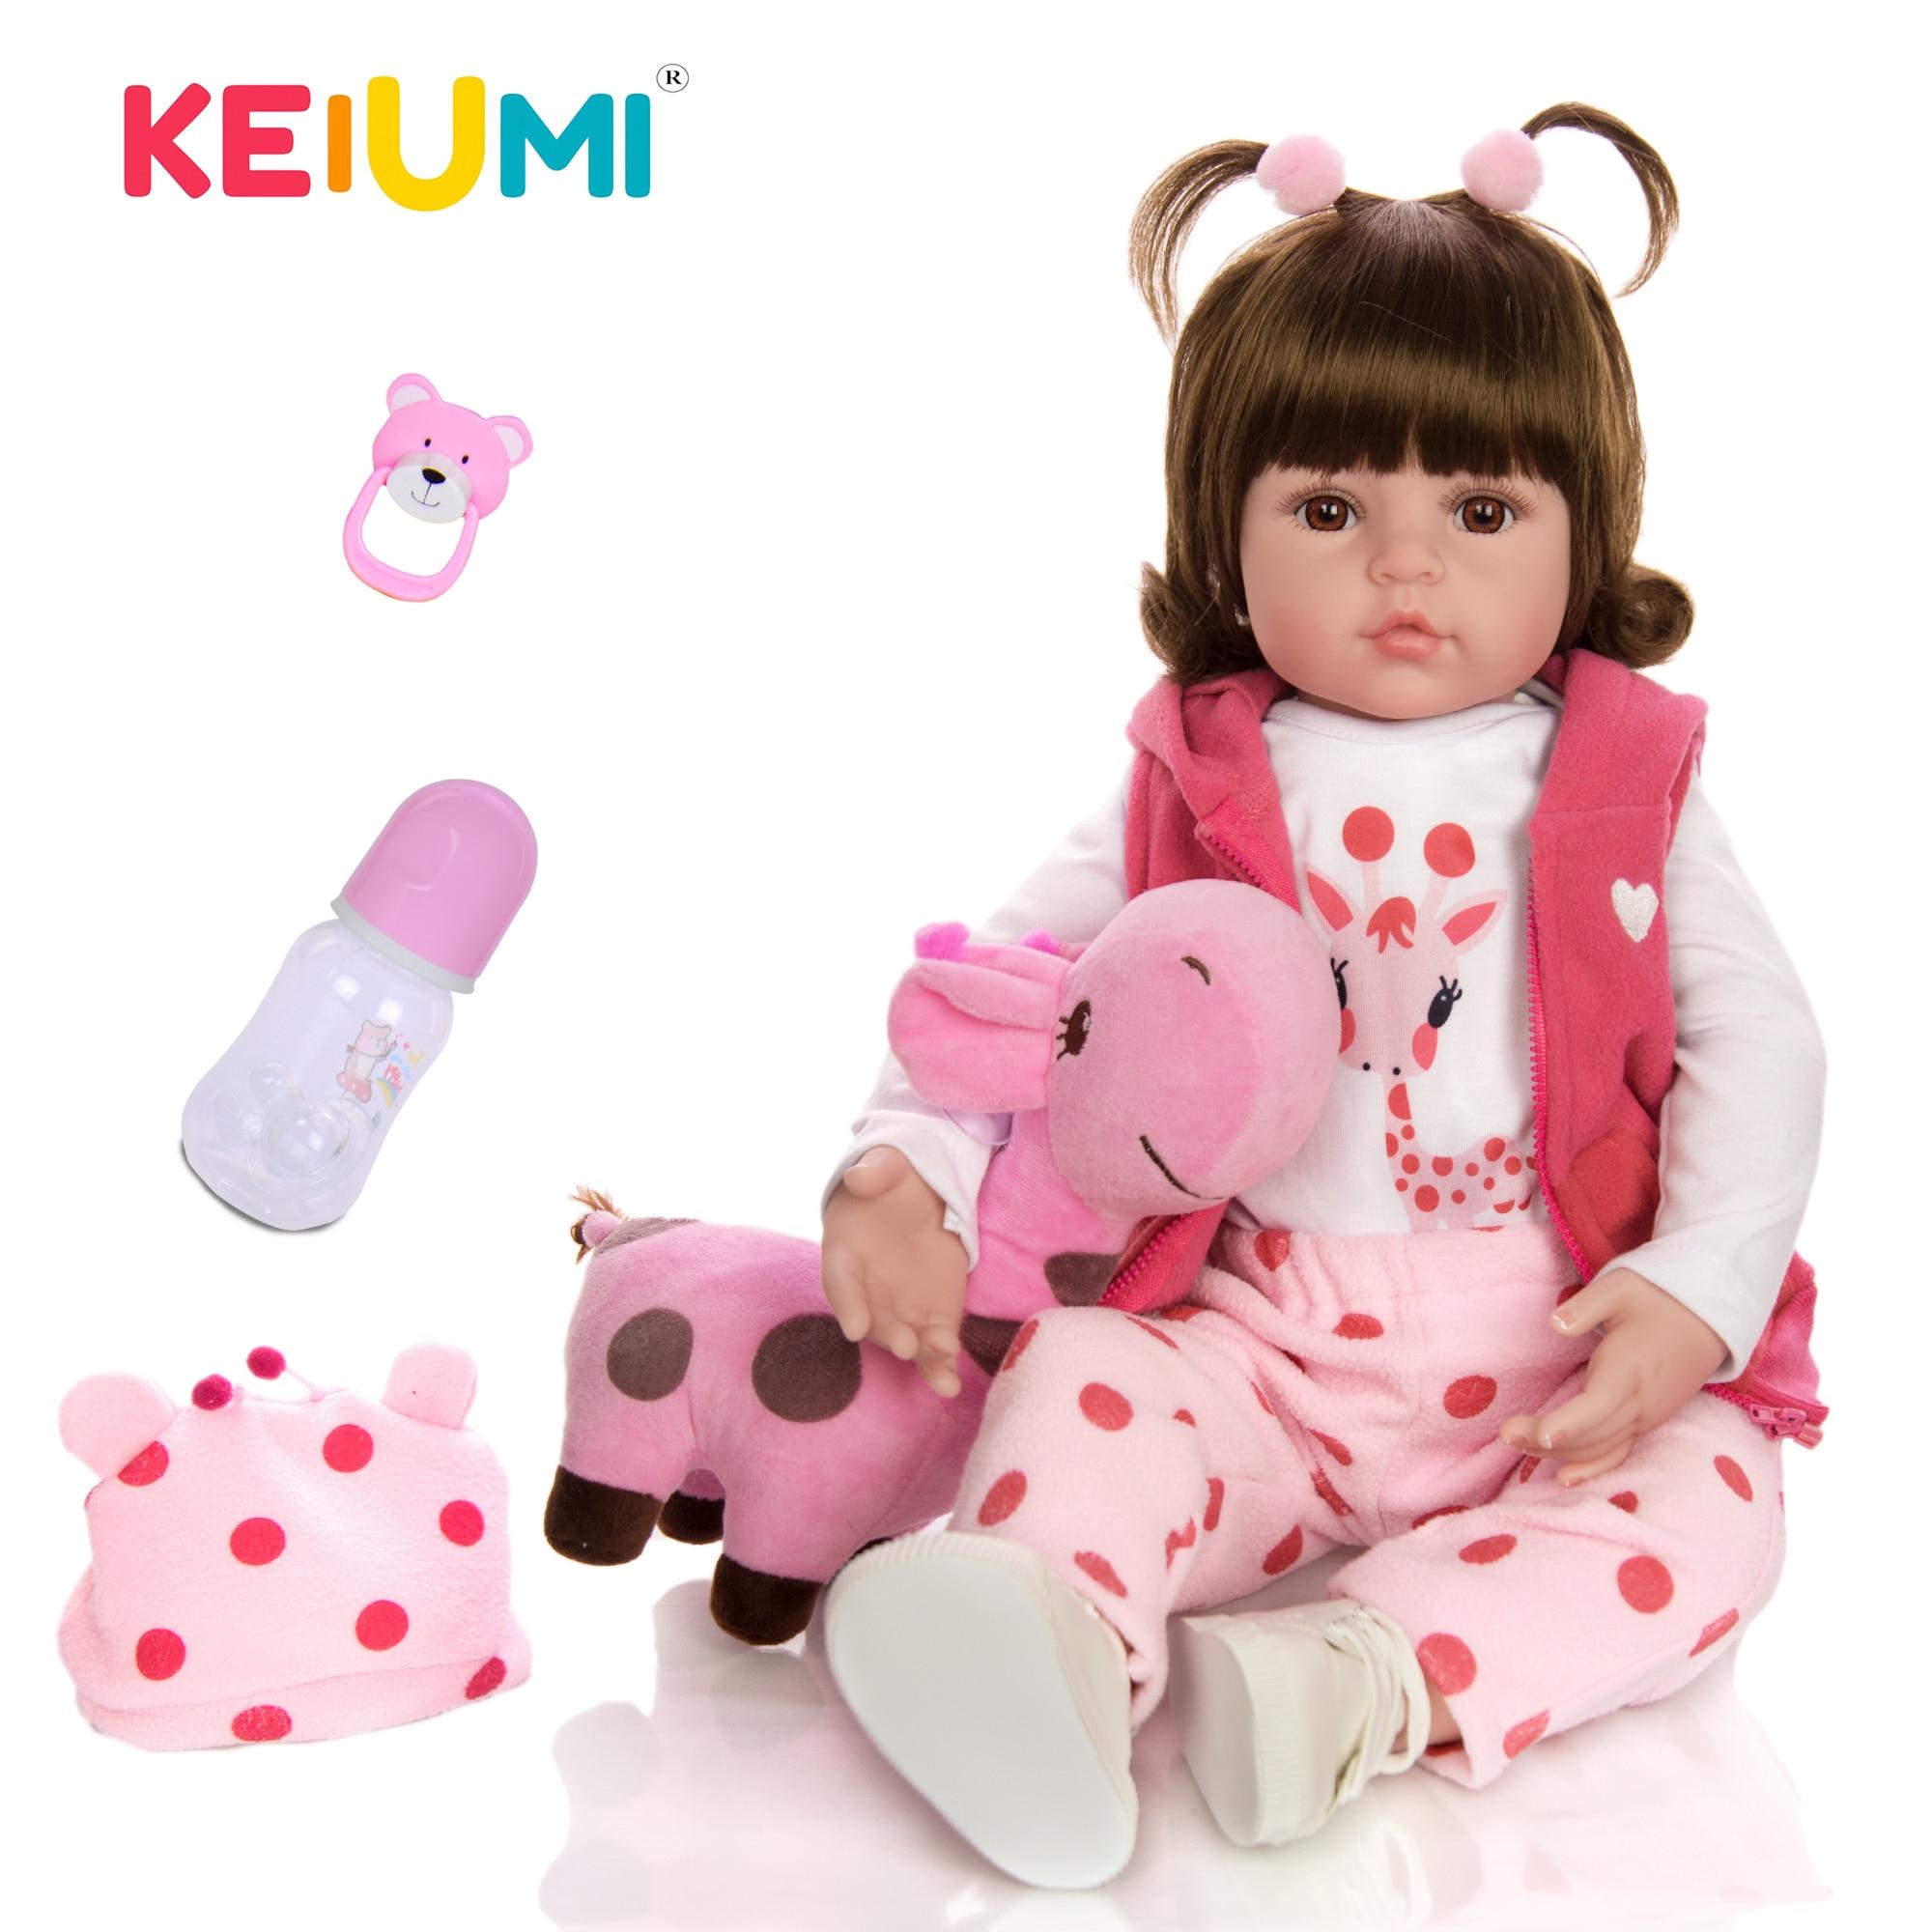 Bebe reborn realiste bébé reborn fille poupée reborn Keiumi 0005